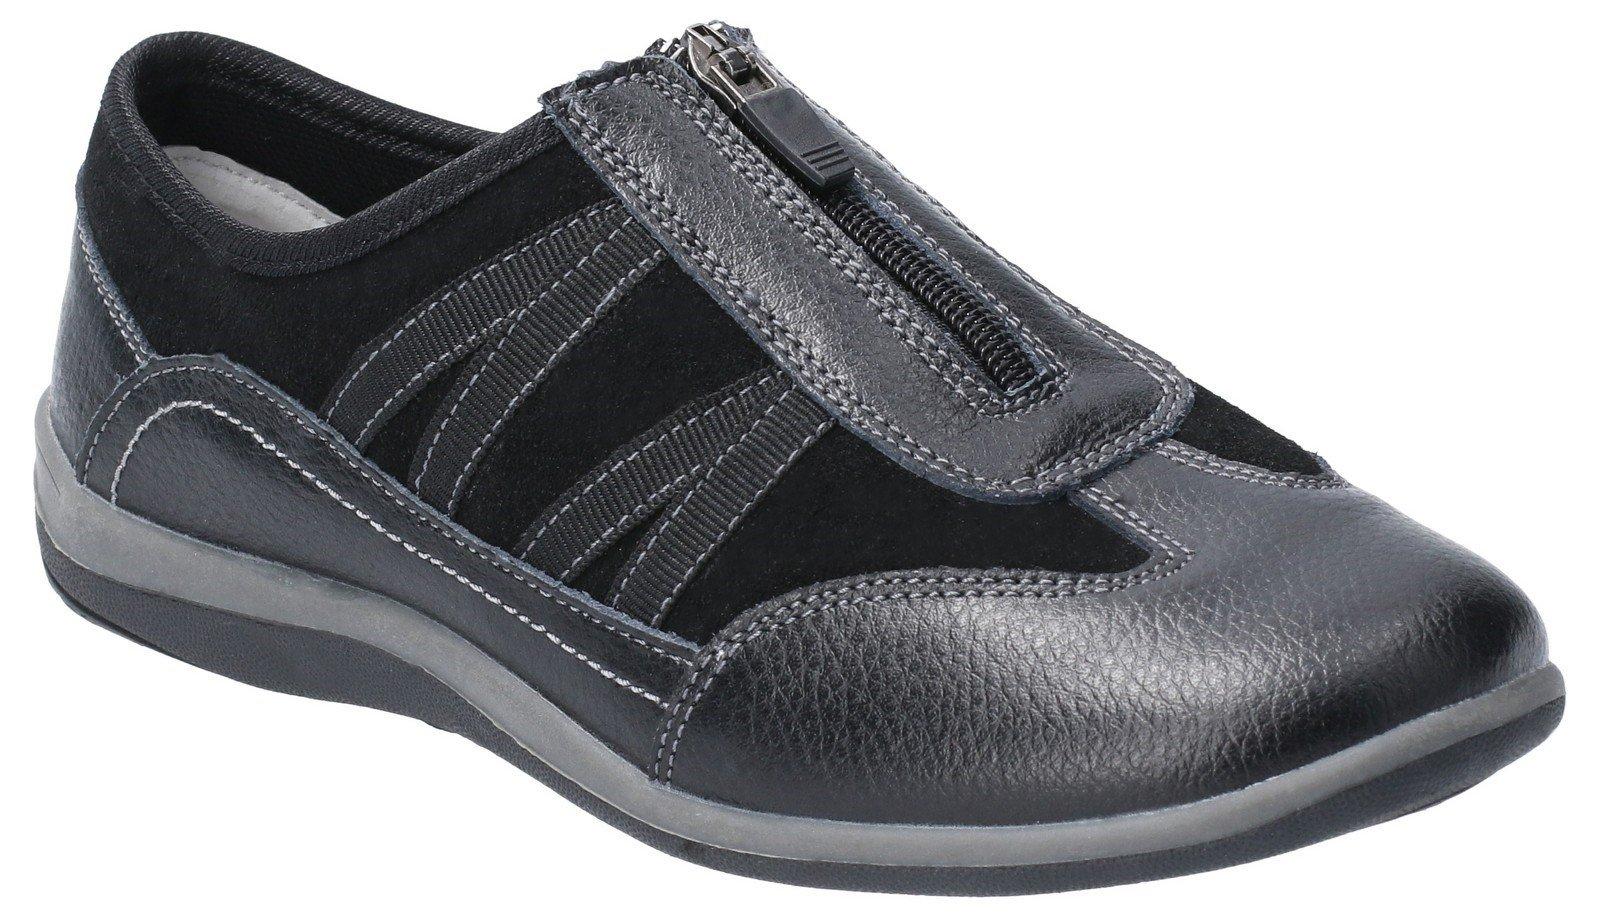 Fleet & Foster Women's Mombassa Leather Trainer Various Colours 29306-49610 - Black 3